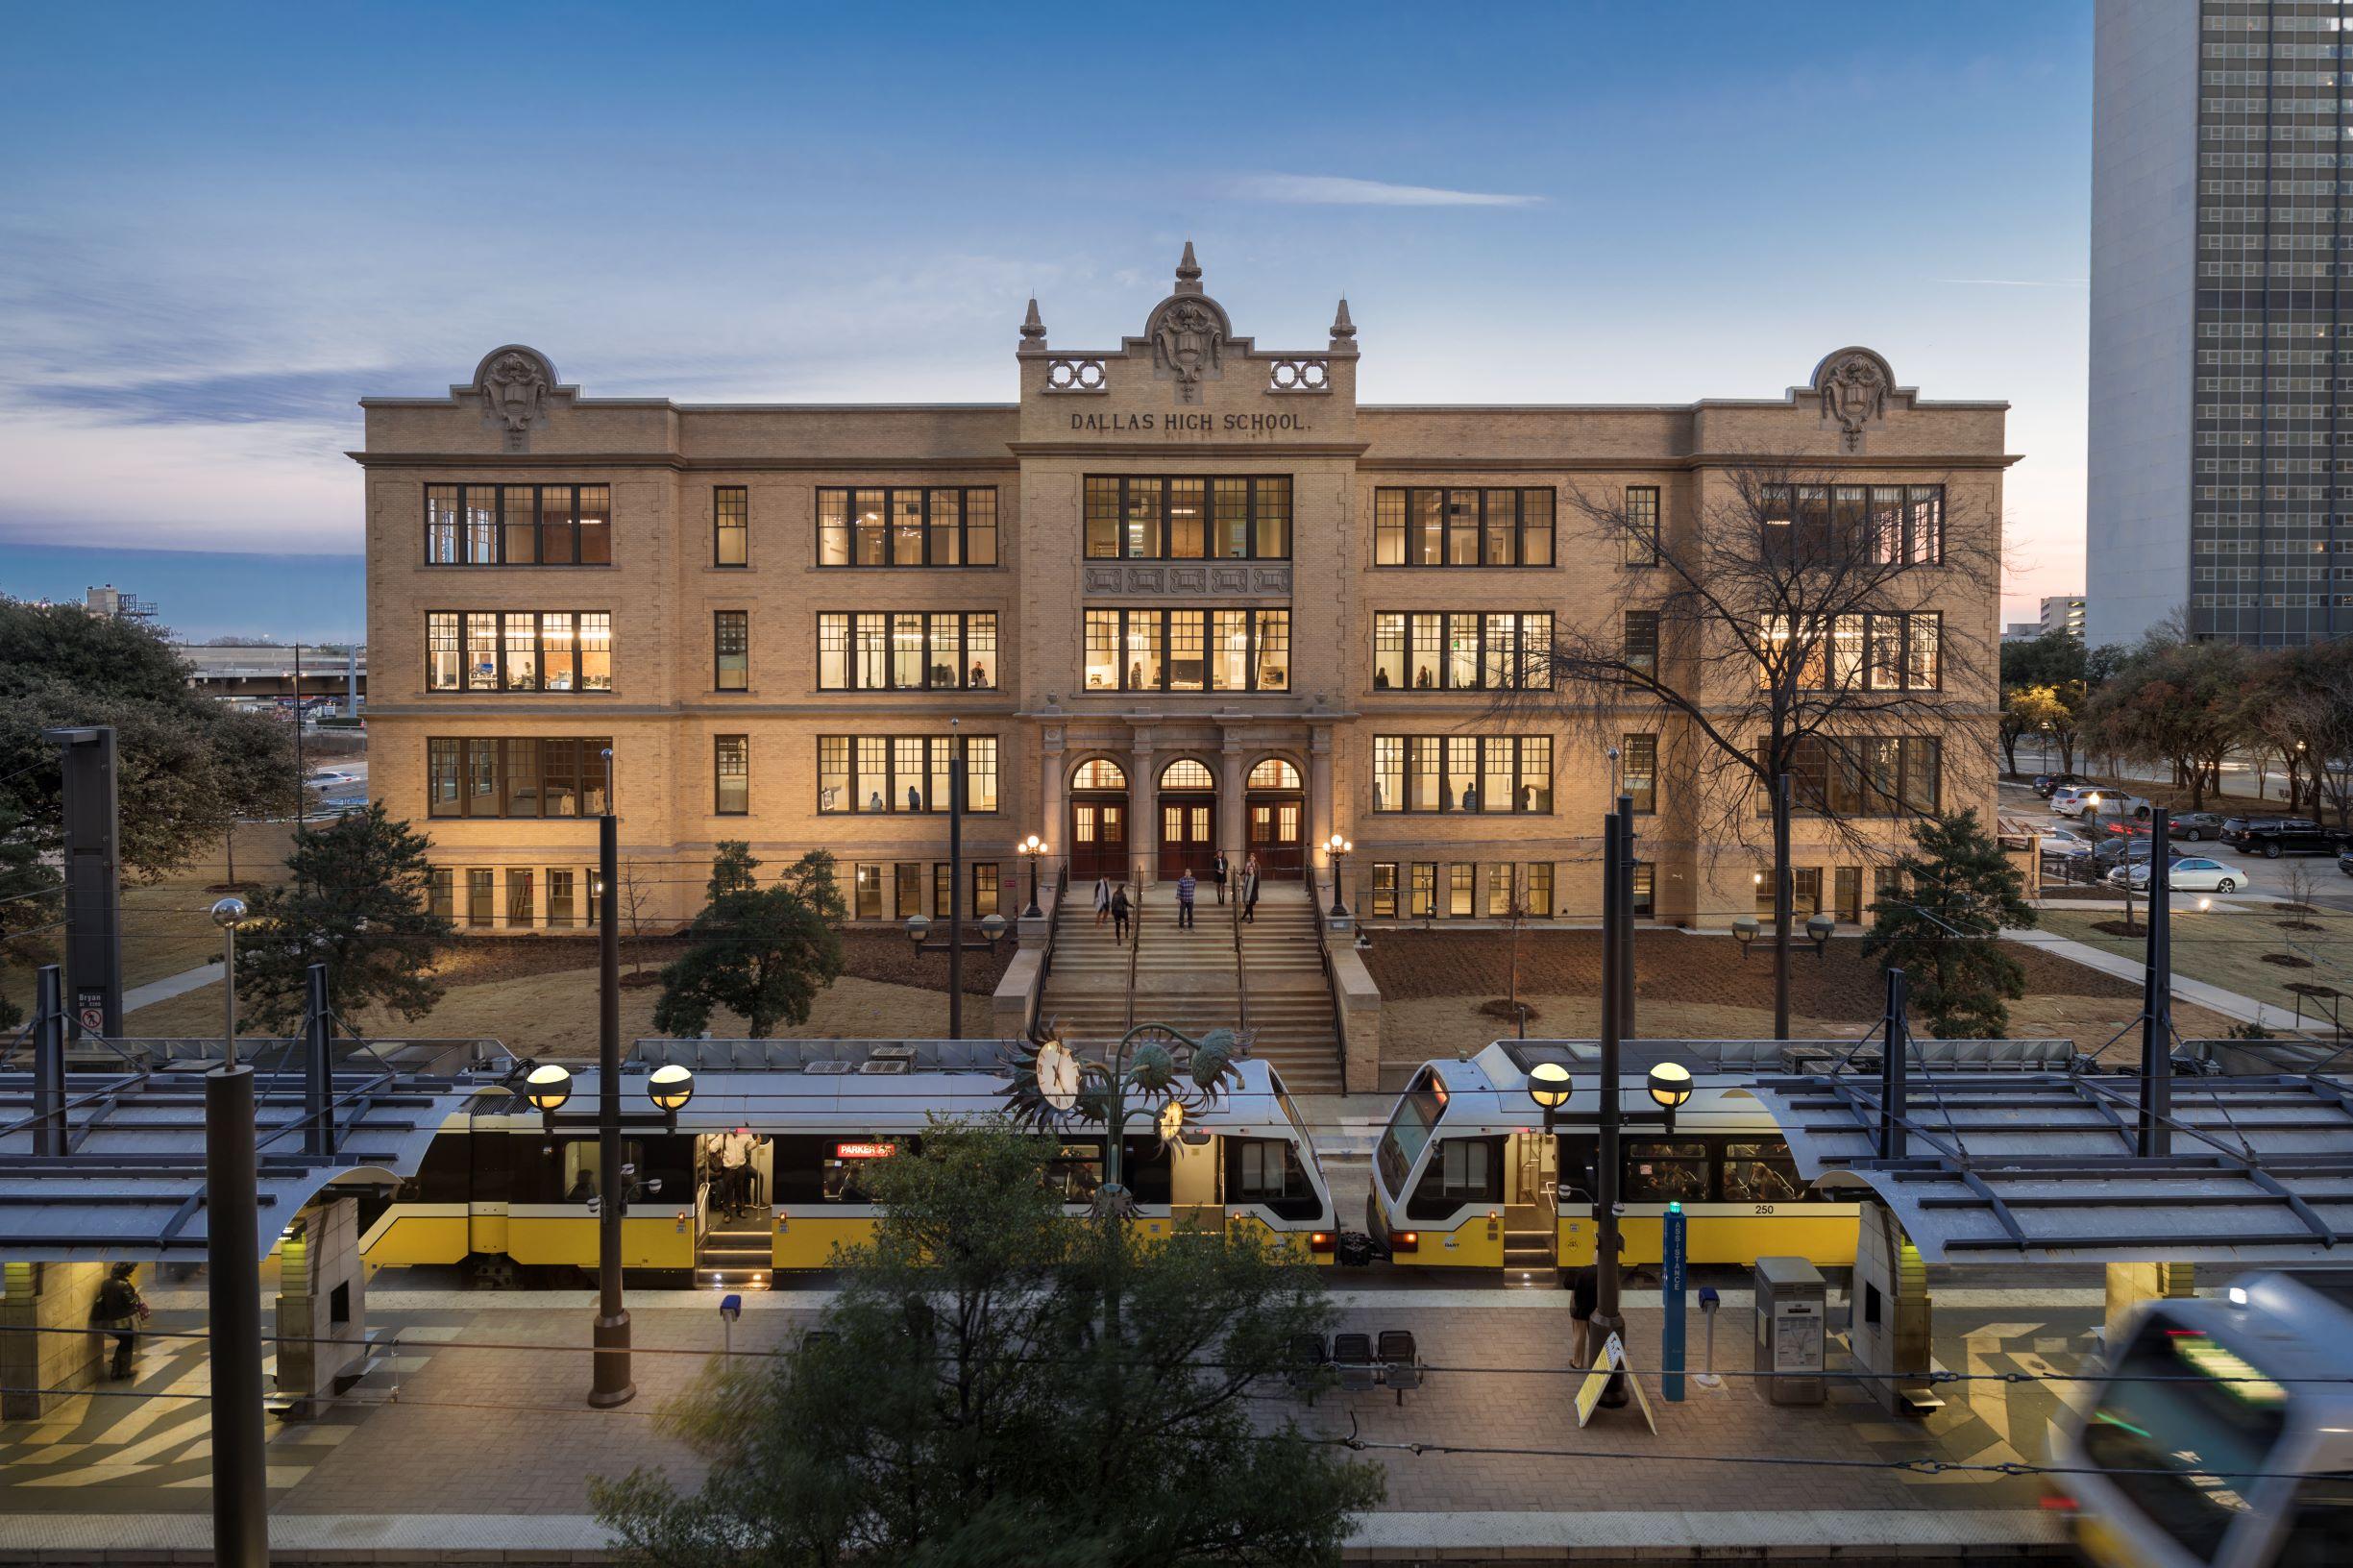 Dallas High School - James Steinkamp Photography_size.tif